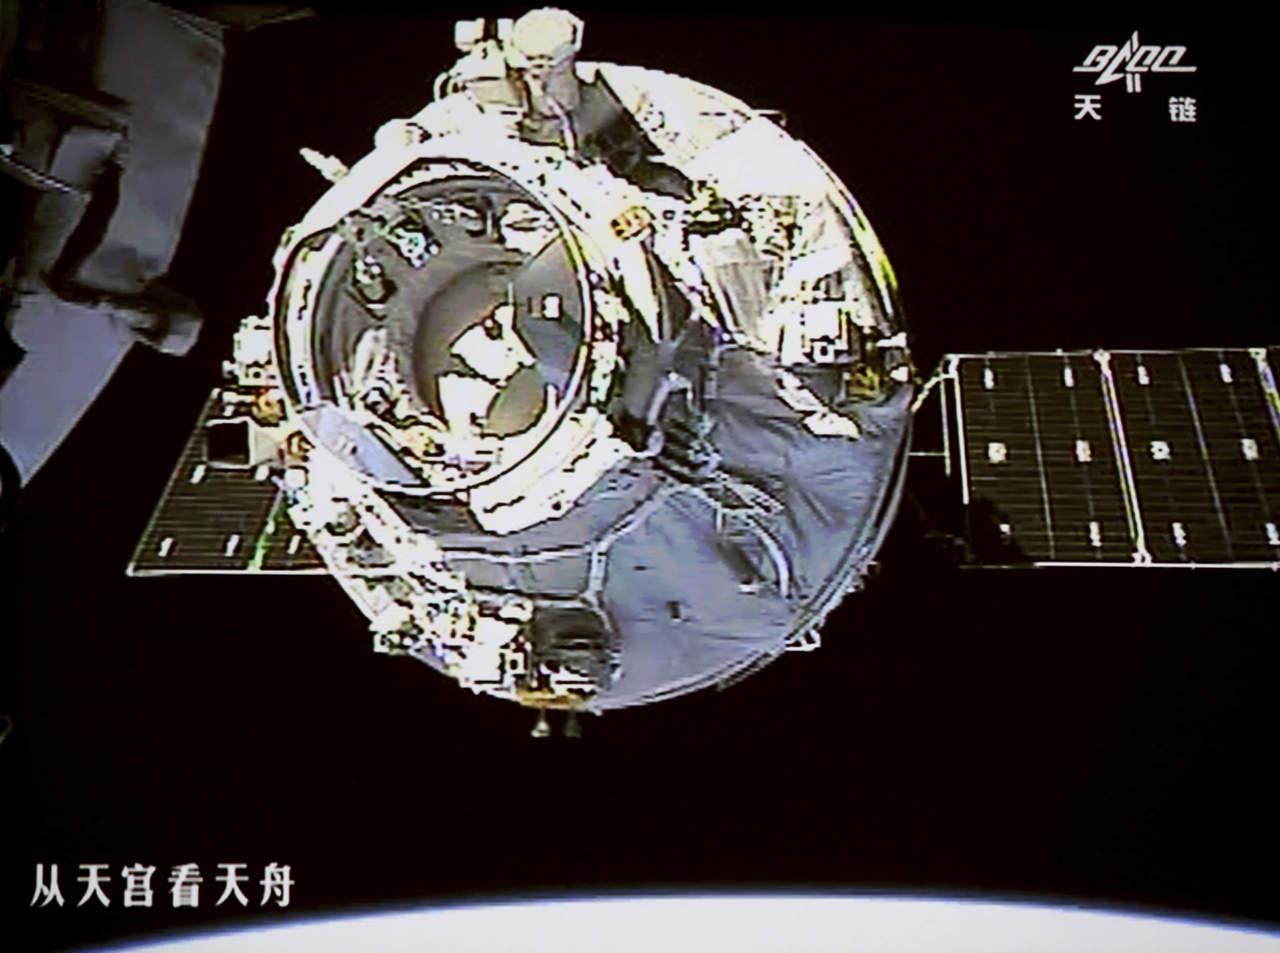 Carguero espacial chino se acopla a laboratorio orbital